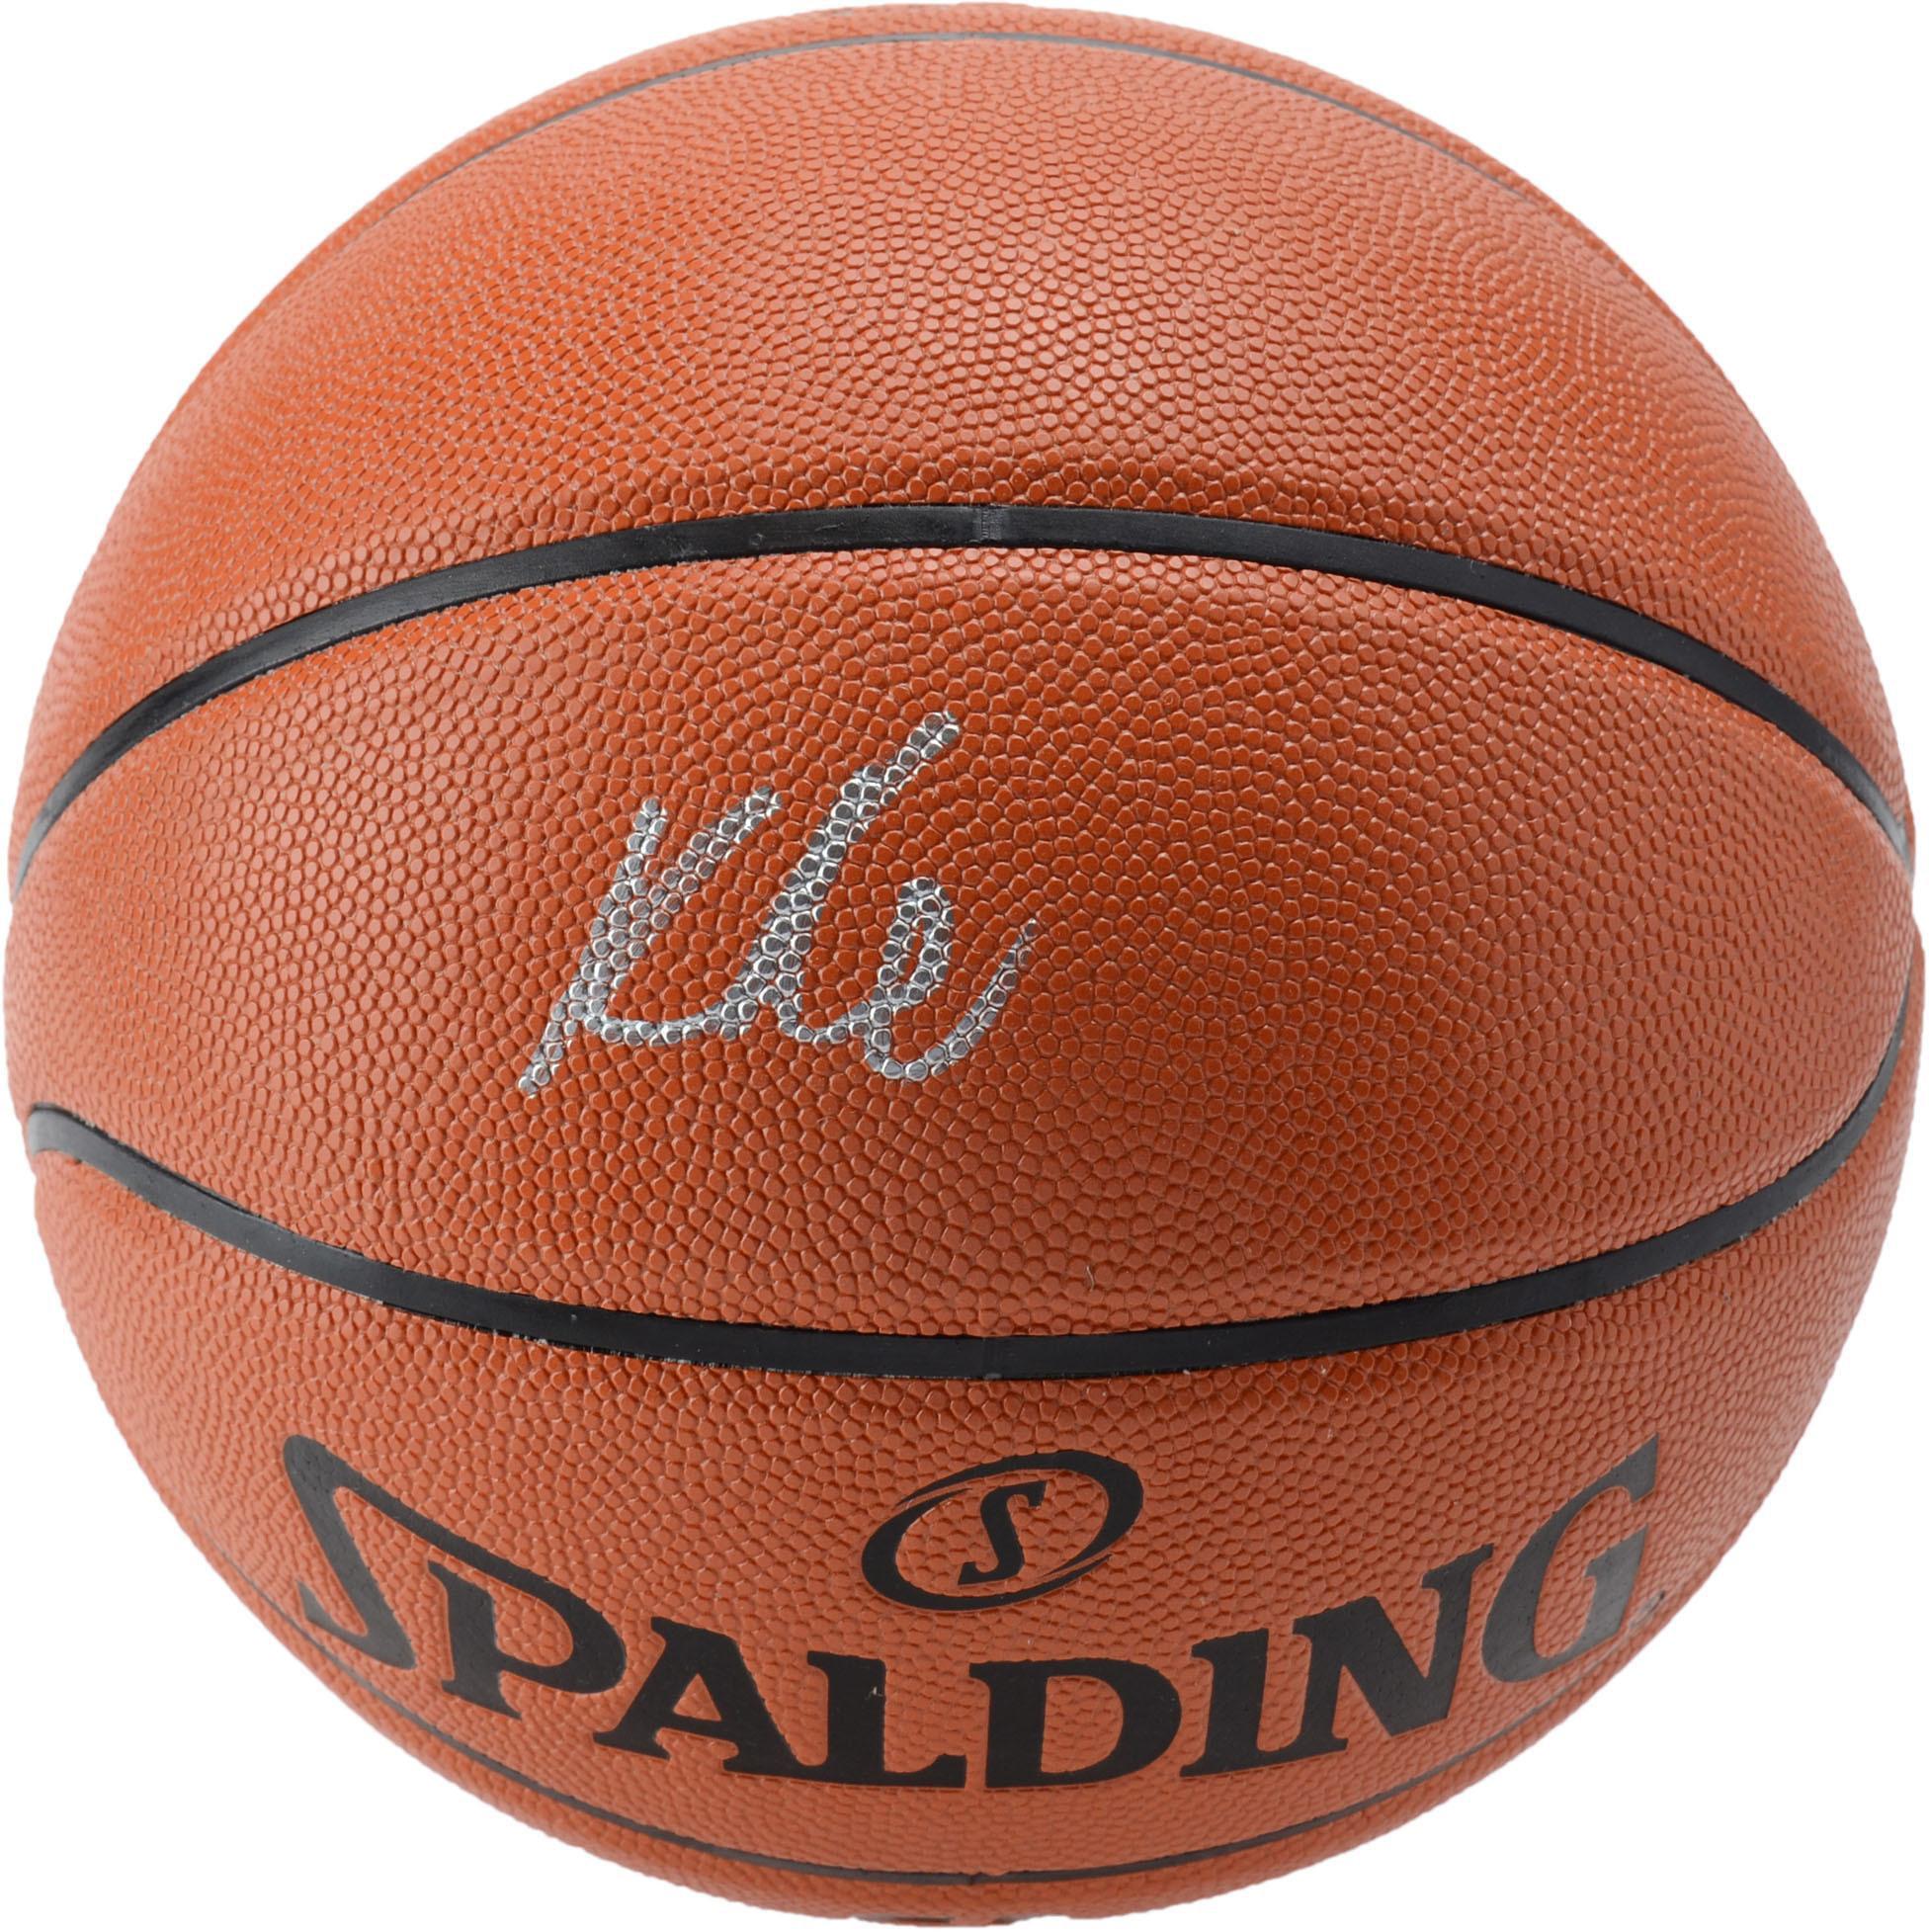 Kyle Kuzma Los Angeles Lakers Autographed Indoor/Outdoor Basketball - Fanatics Authentic Certified